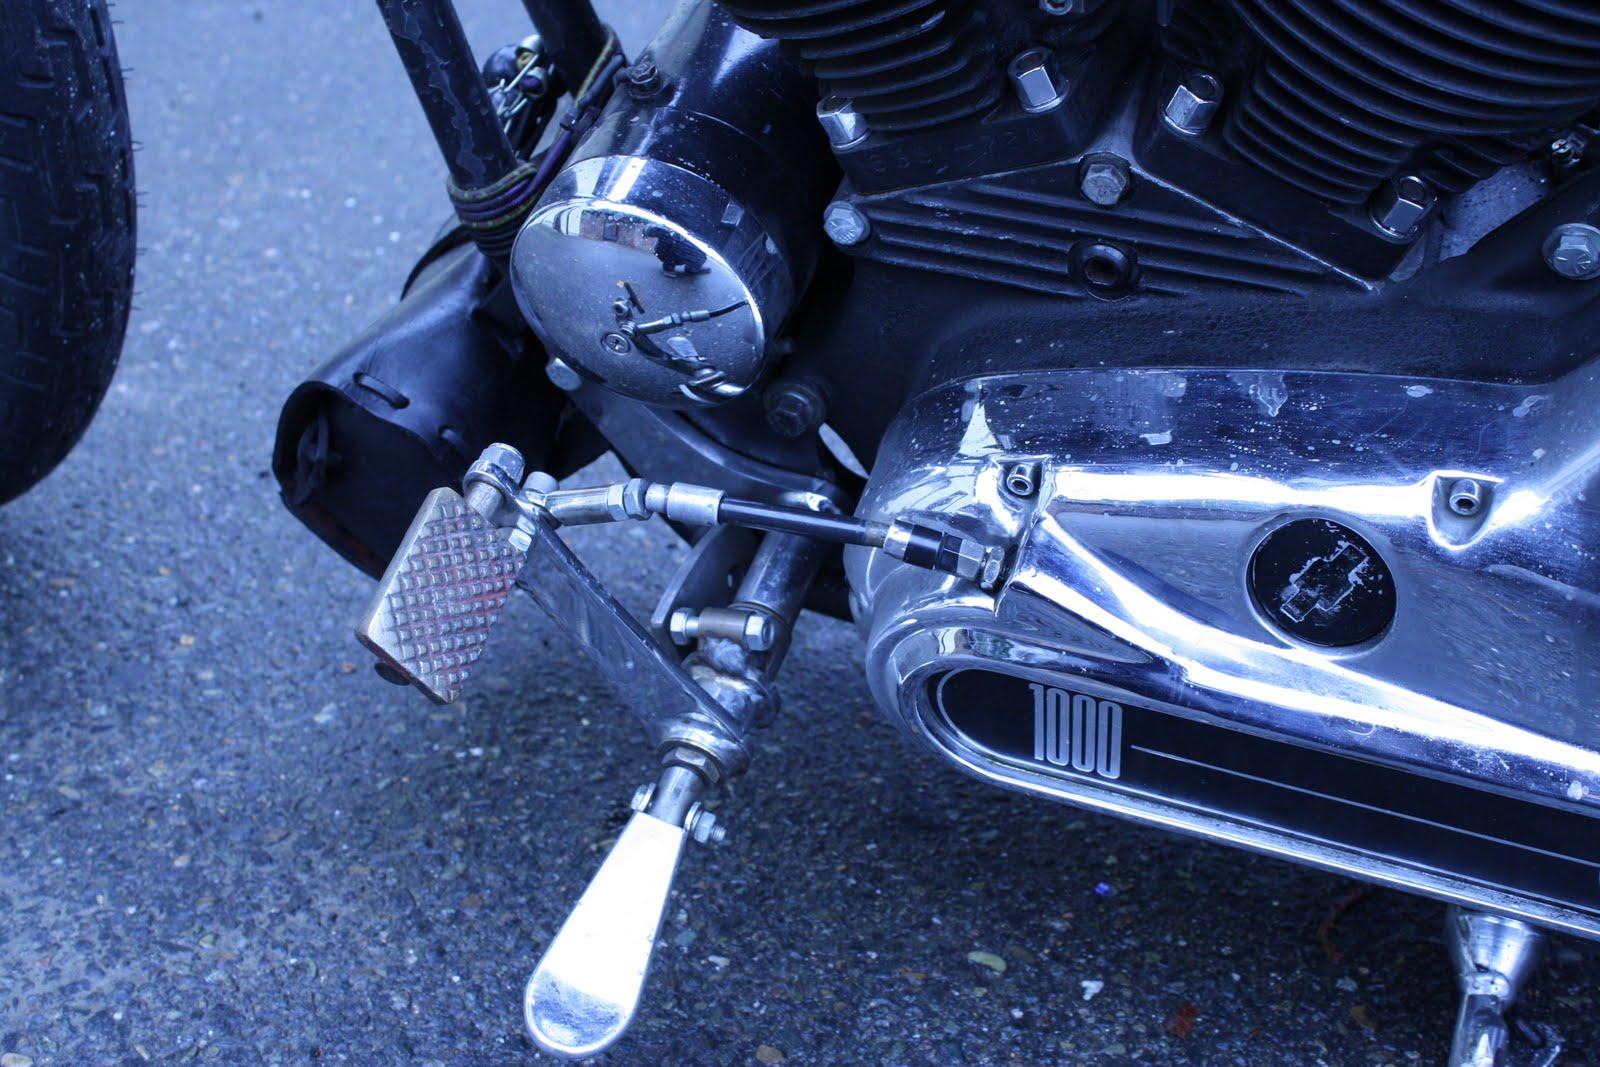 Old-Stf Cycle: Ironhead Sportster Jockey Shift